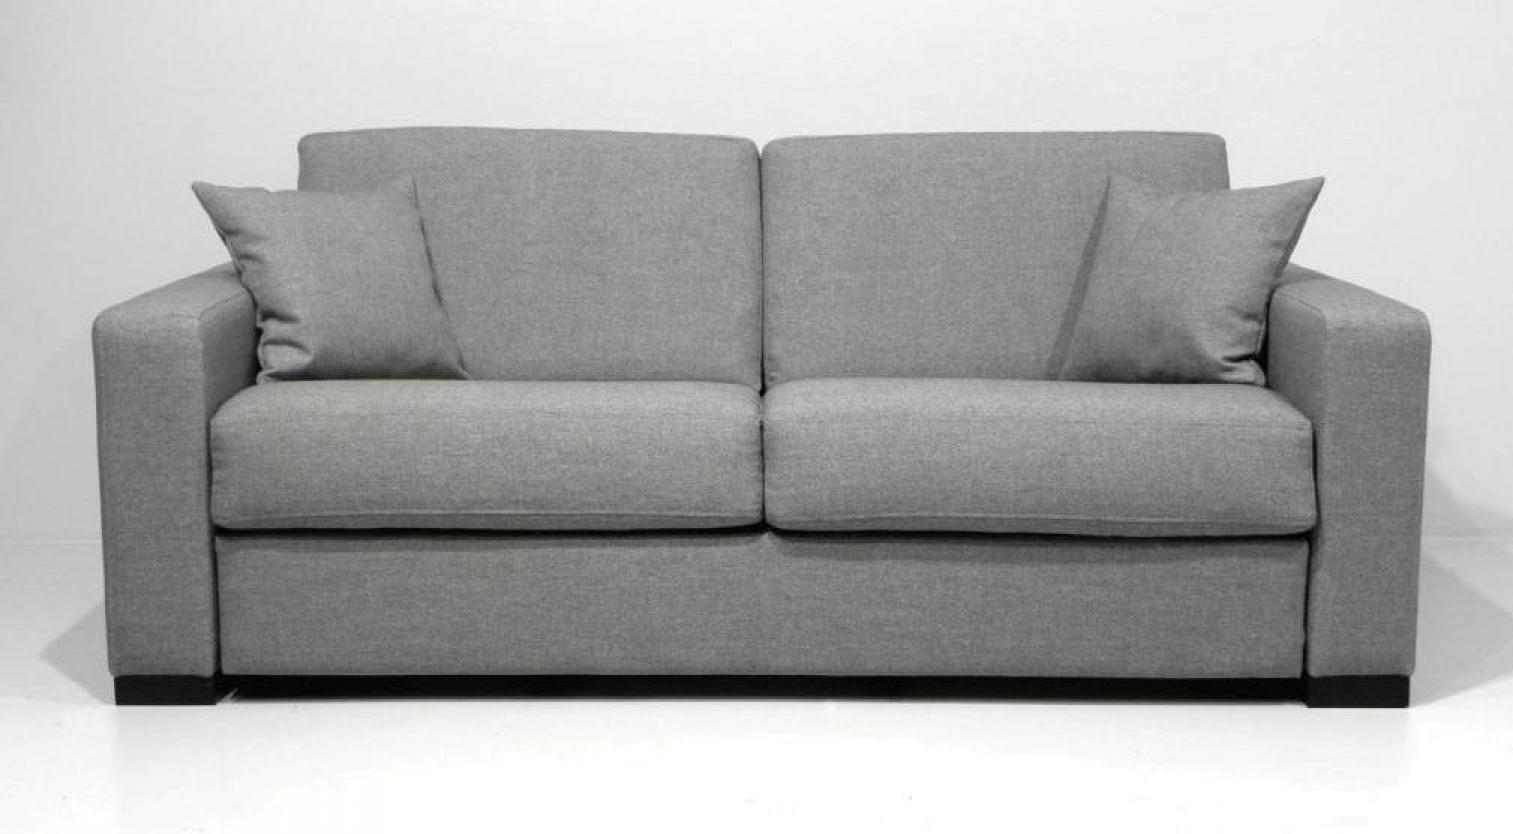 photos canap convertible gris clair. Black Bedroom Furniture Sets. Home Design Ideas